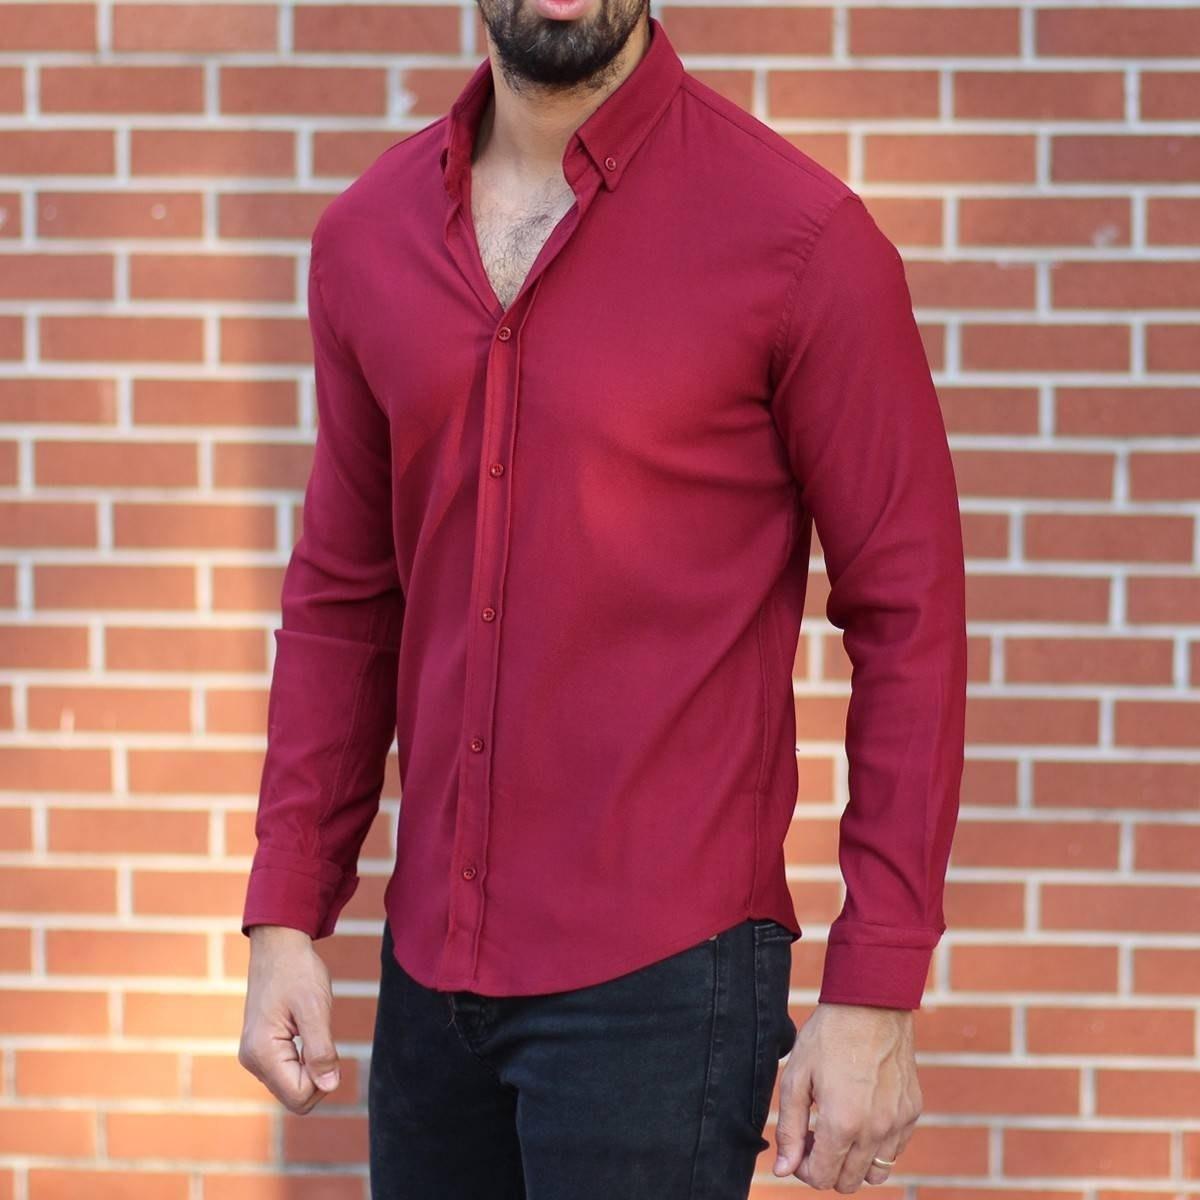 Men's Stylish Lycra Shirt In Red Mv Premium Brand - 3